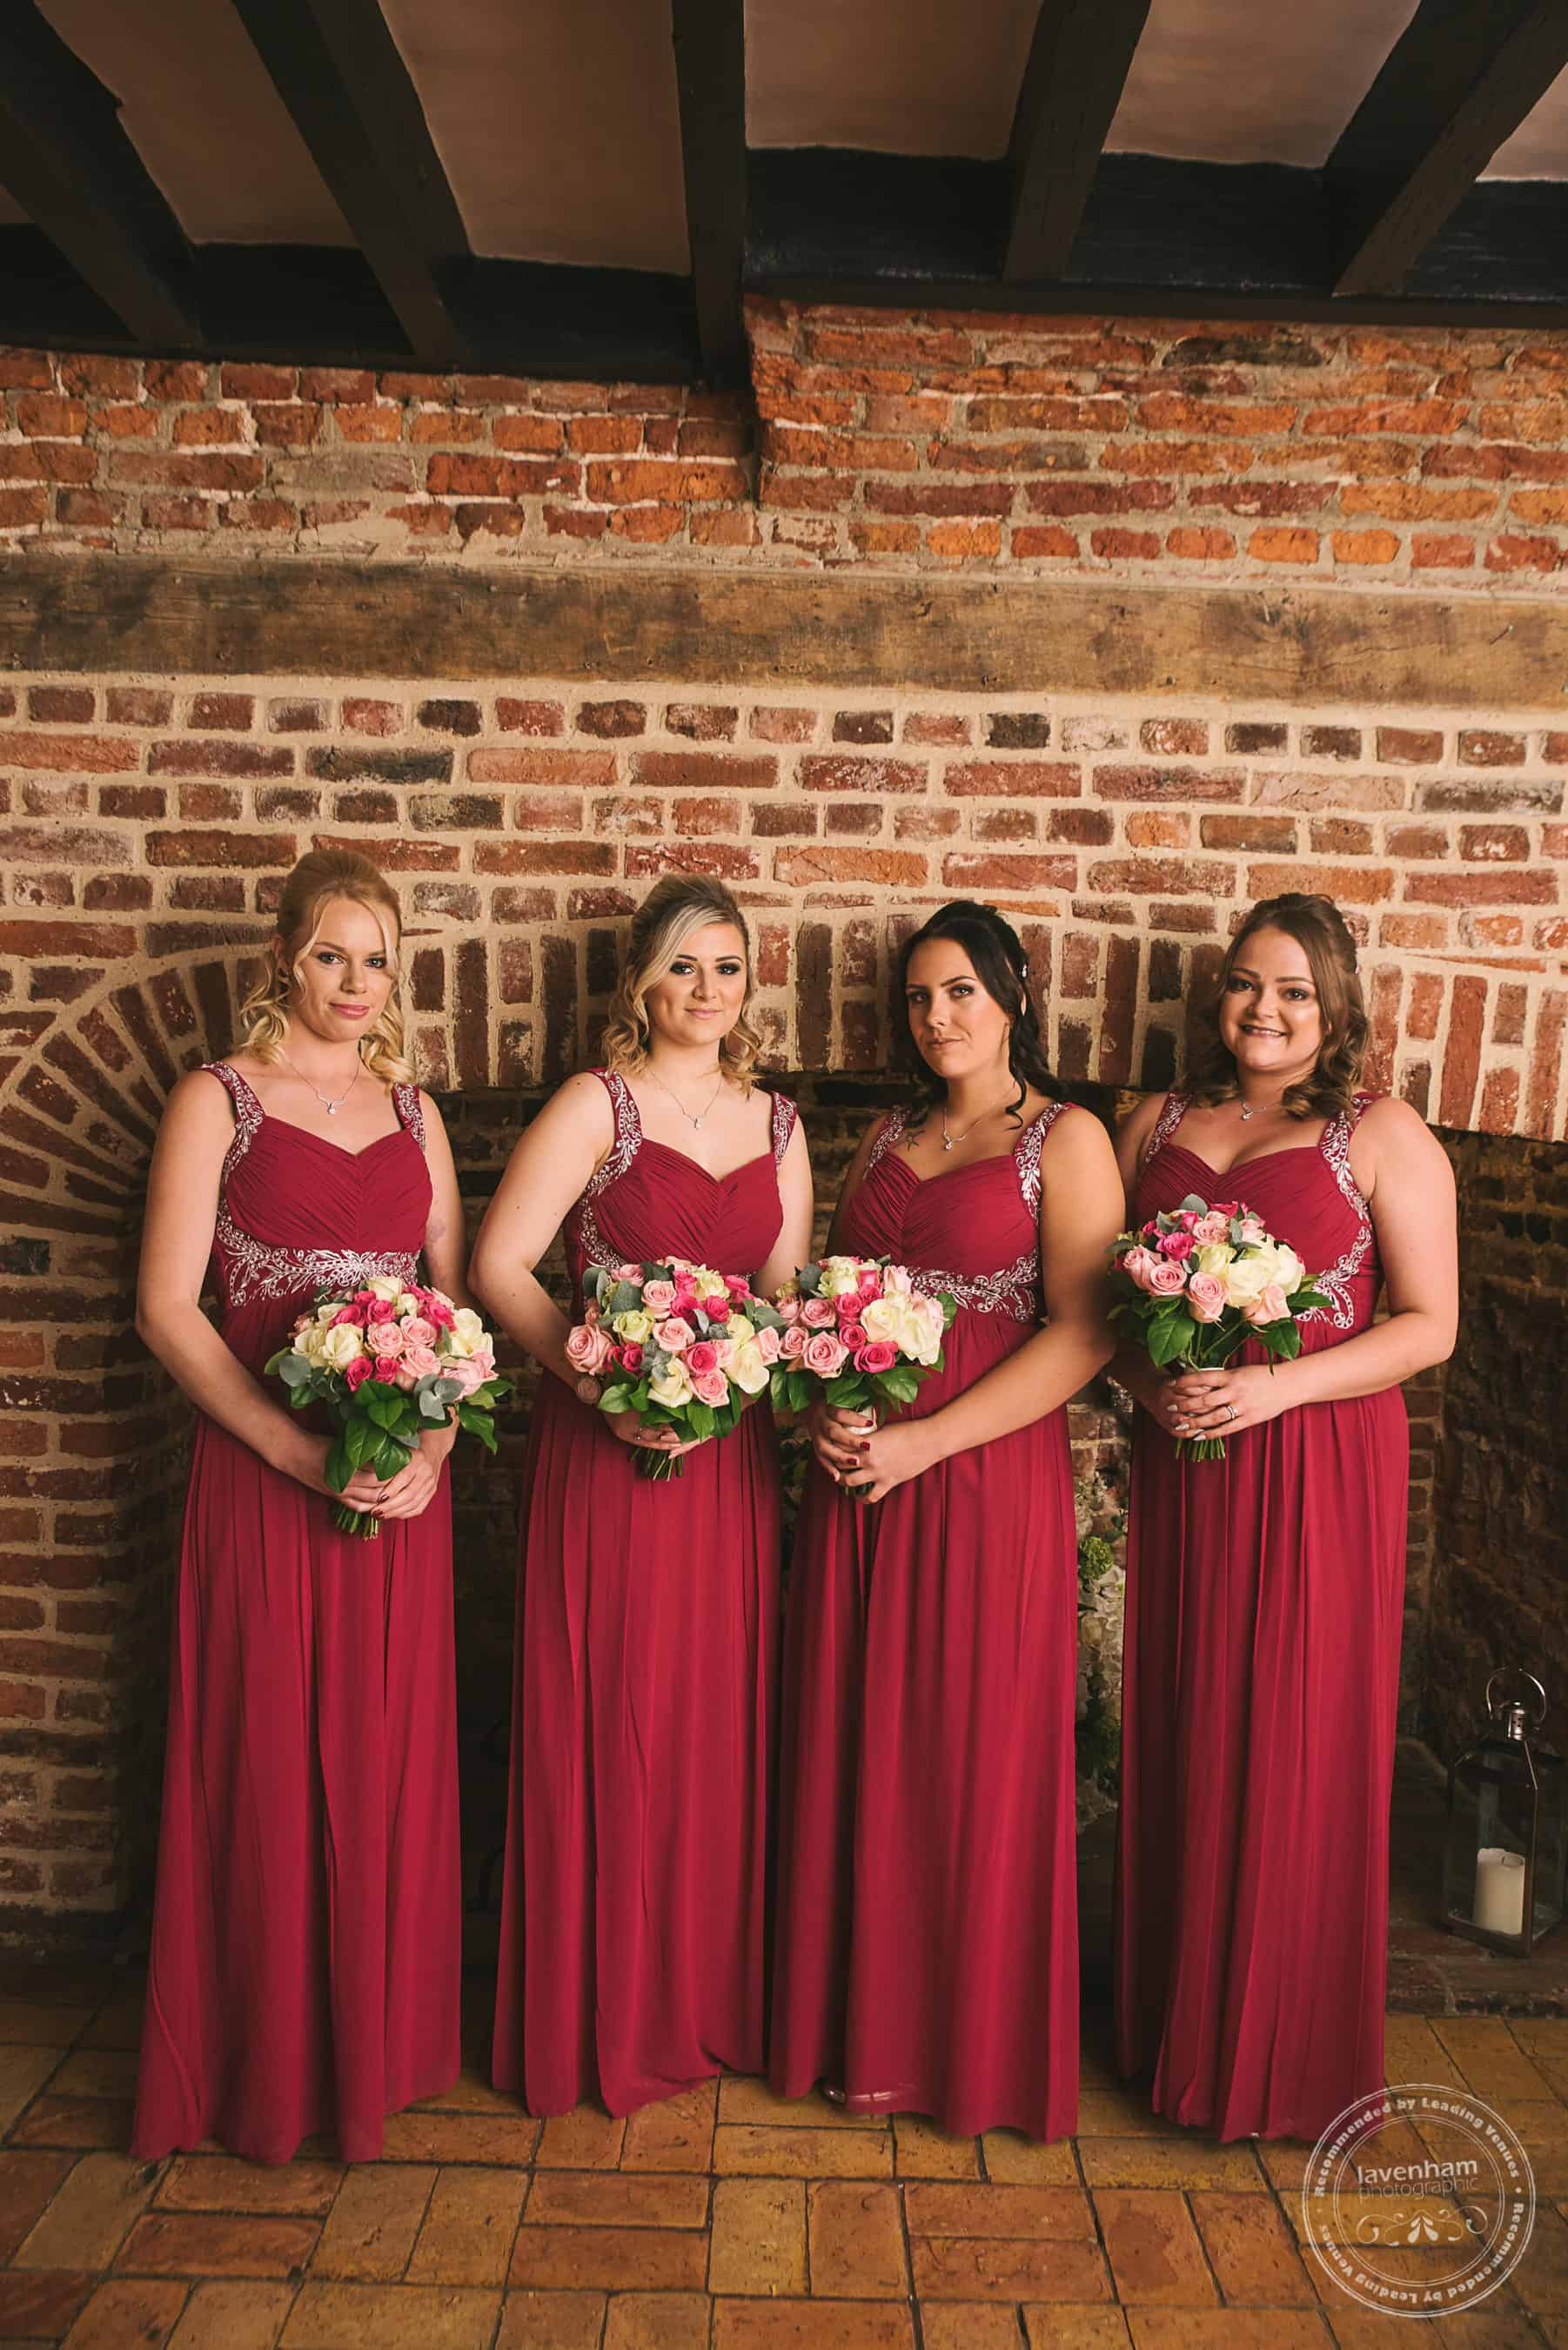 251118 Leez Priory Wedding Photography by Lavenham Photographic 026